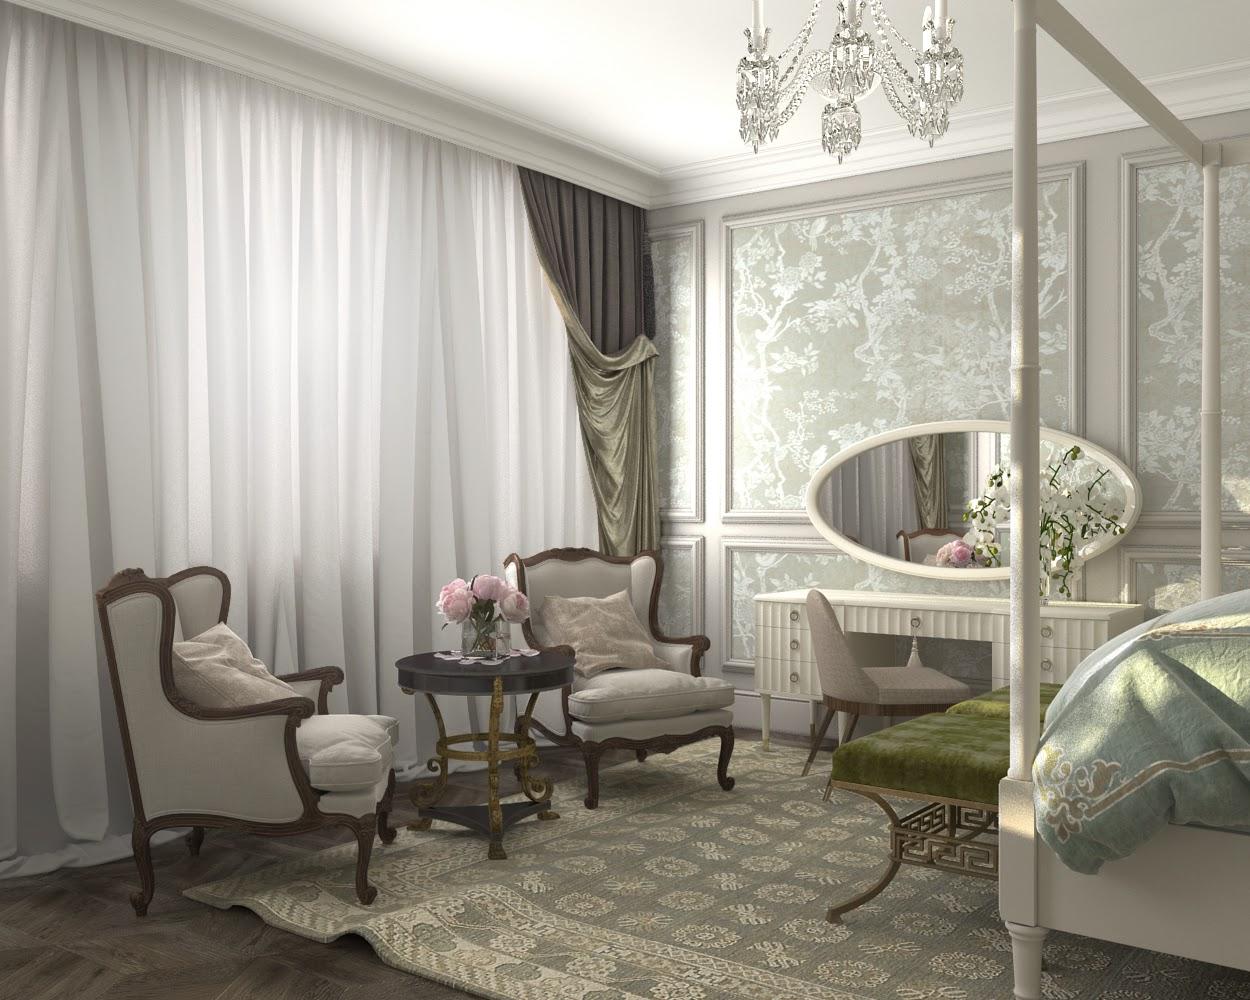 darya girina interior design interior design of lux